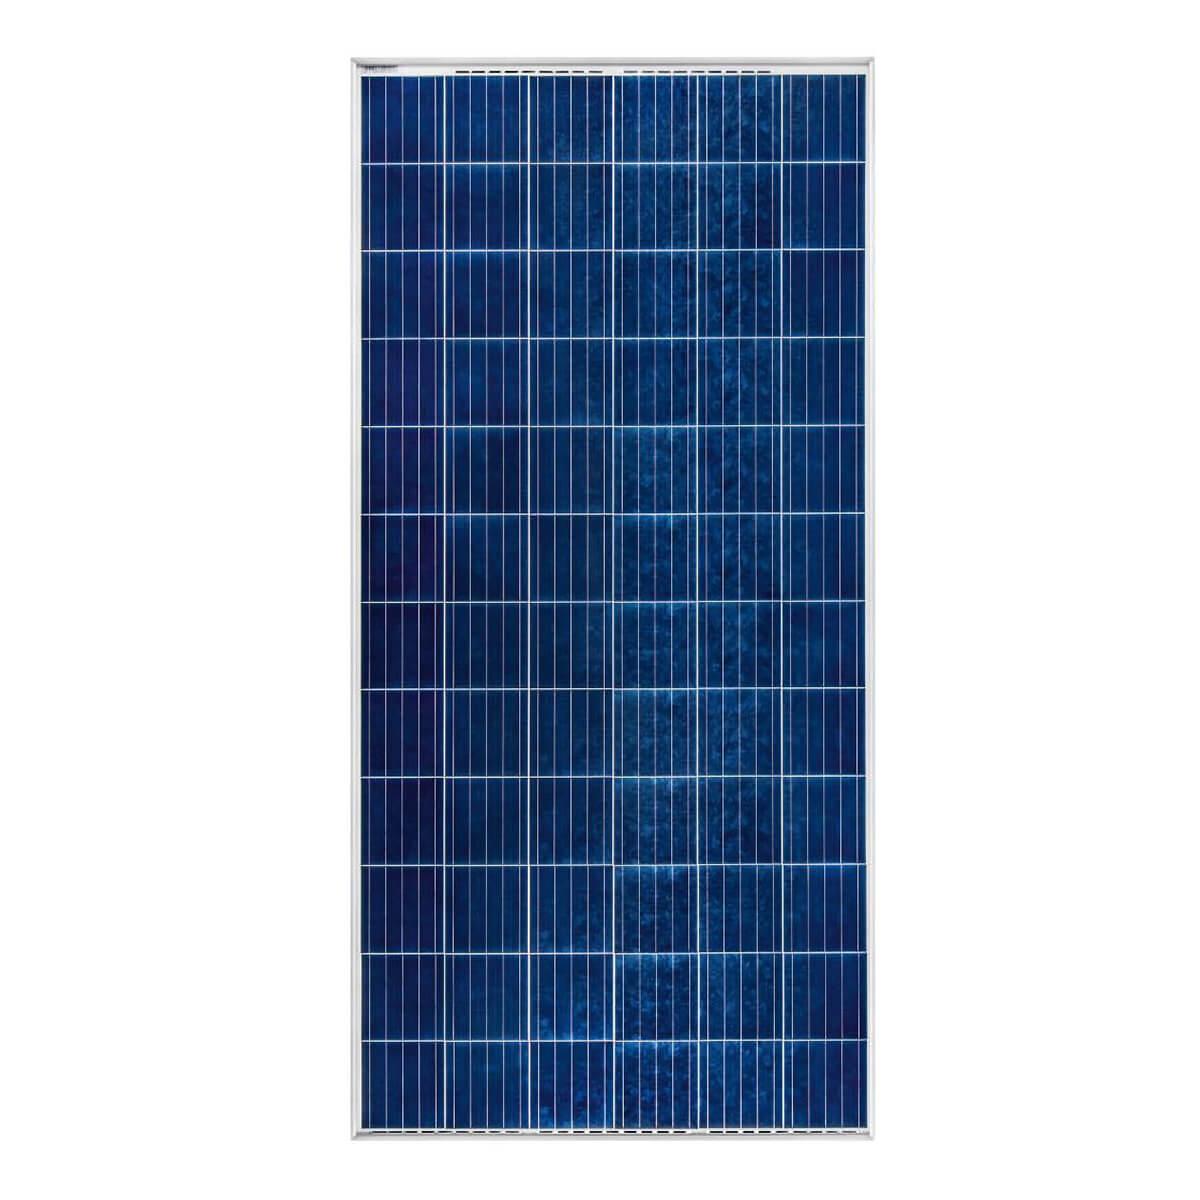 Odul solar 345W panel, odul solar 345Watt panel, Odul solar 345 W panel, odul solar 345 Watt panel, odul solar 345 Watt polikristal panel, Odul solar 345 W watt gunes paneli, odul solar 345 W watt polikristal gunes paneli, odul solar 345 W Watt fotovoltaik polikristal solar panel, odul solar 345W polikristal gunes enerjisi, odul solar OSPp72-345W panel, ÖDÜL SOLAR 345 WATT